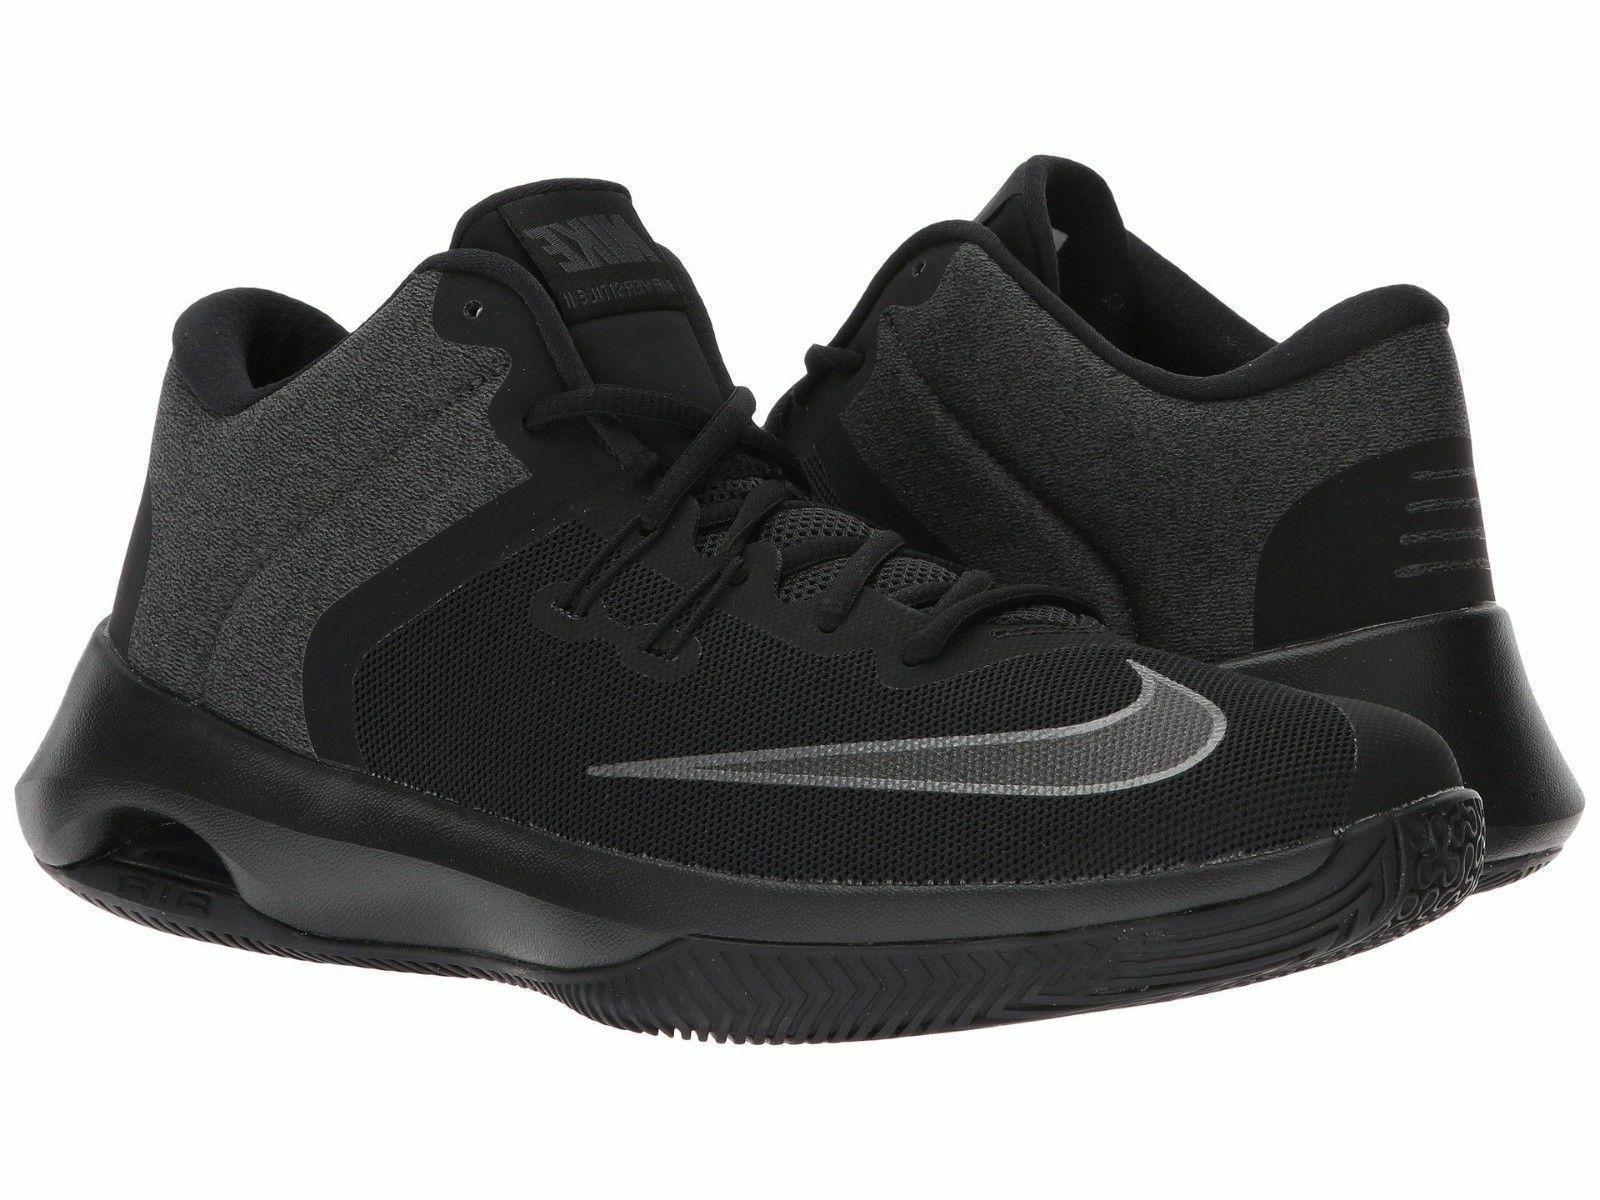 Nike Air NBK Basketball Shoes AA3819 002 Grey